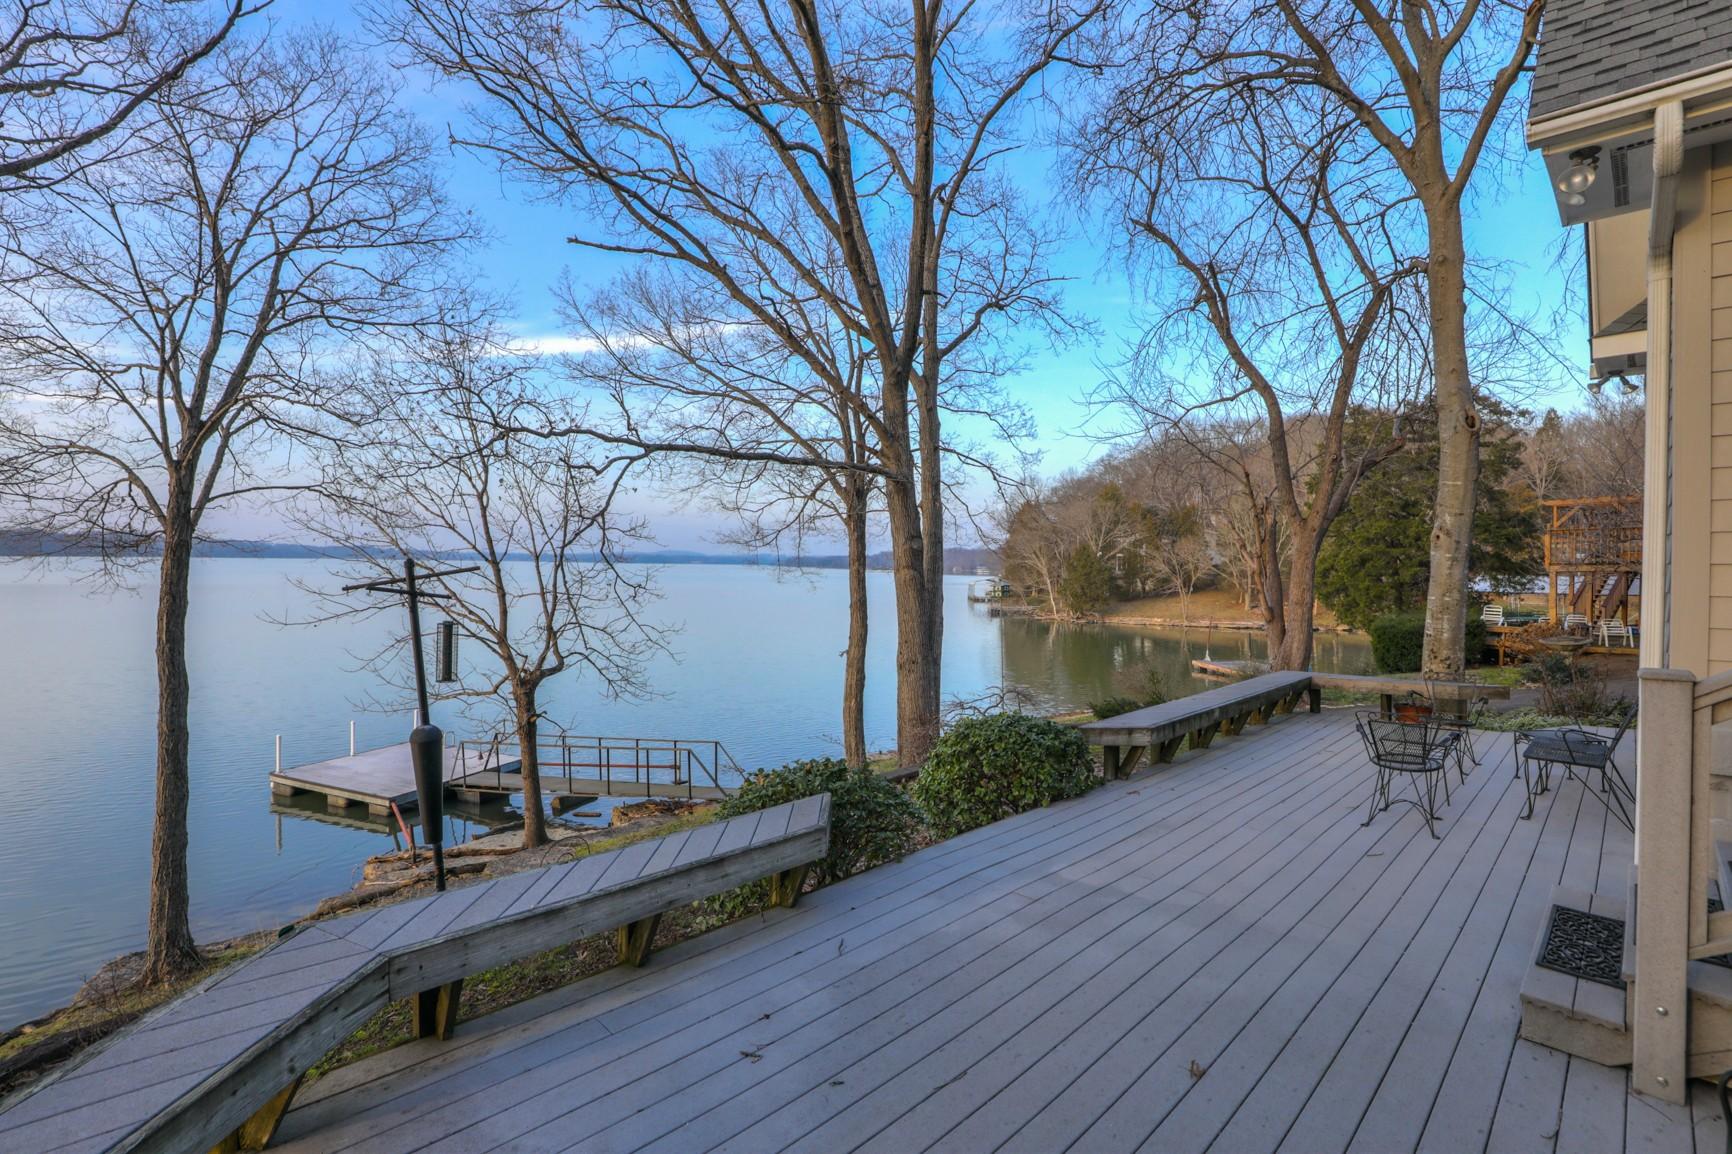 415 Beacon Hill Dr, Mount Juliet, TN 37122 - Mount Juliet, TN real estate listing